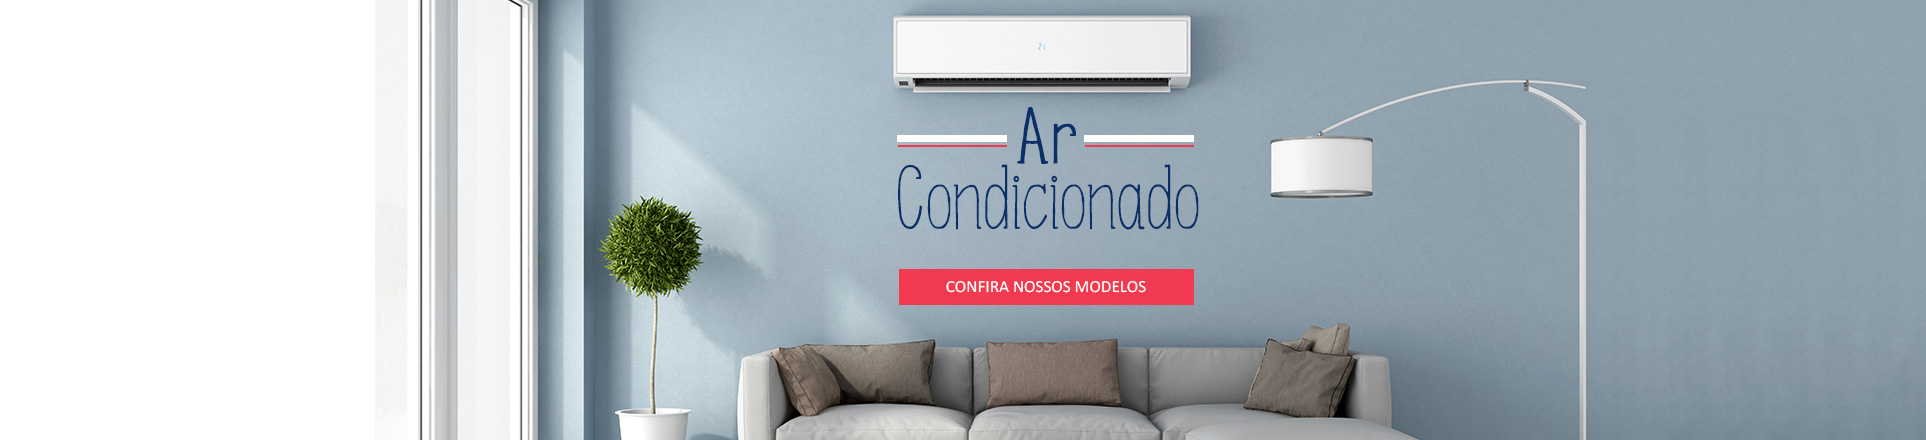 3- Campanha - Ar Condicionado